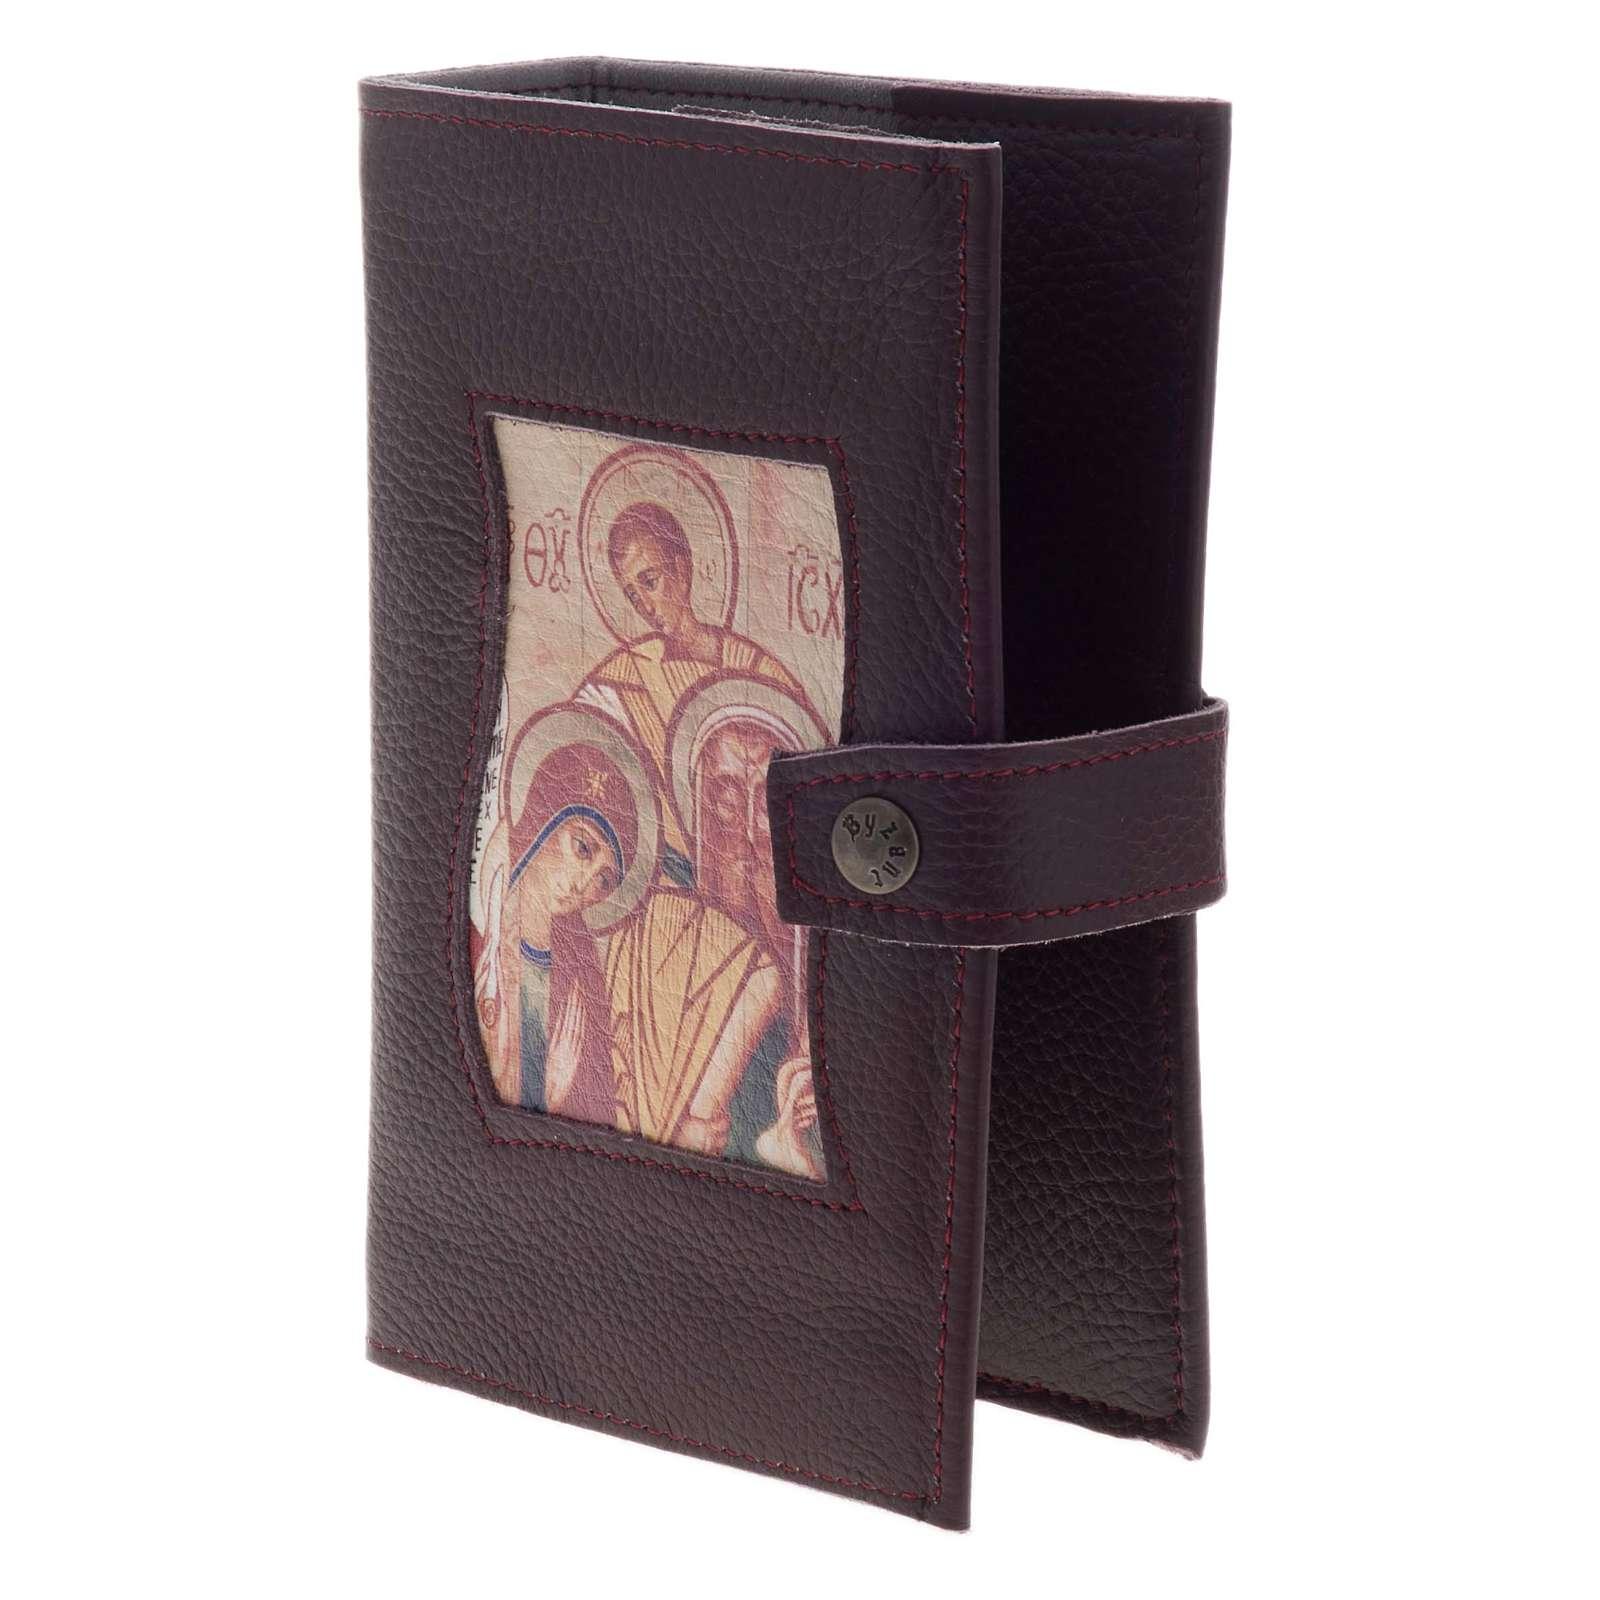 Copertina Neocatecumenale Sacra Famiglia bourdeaux 4